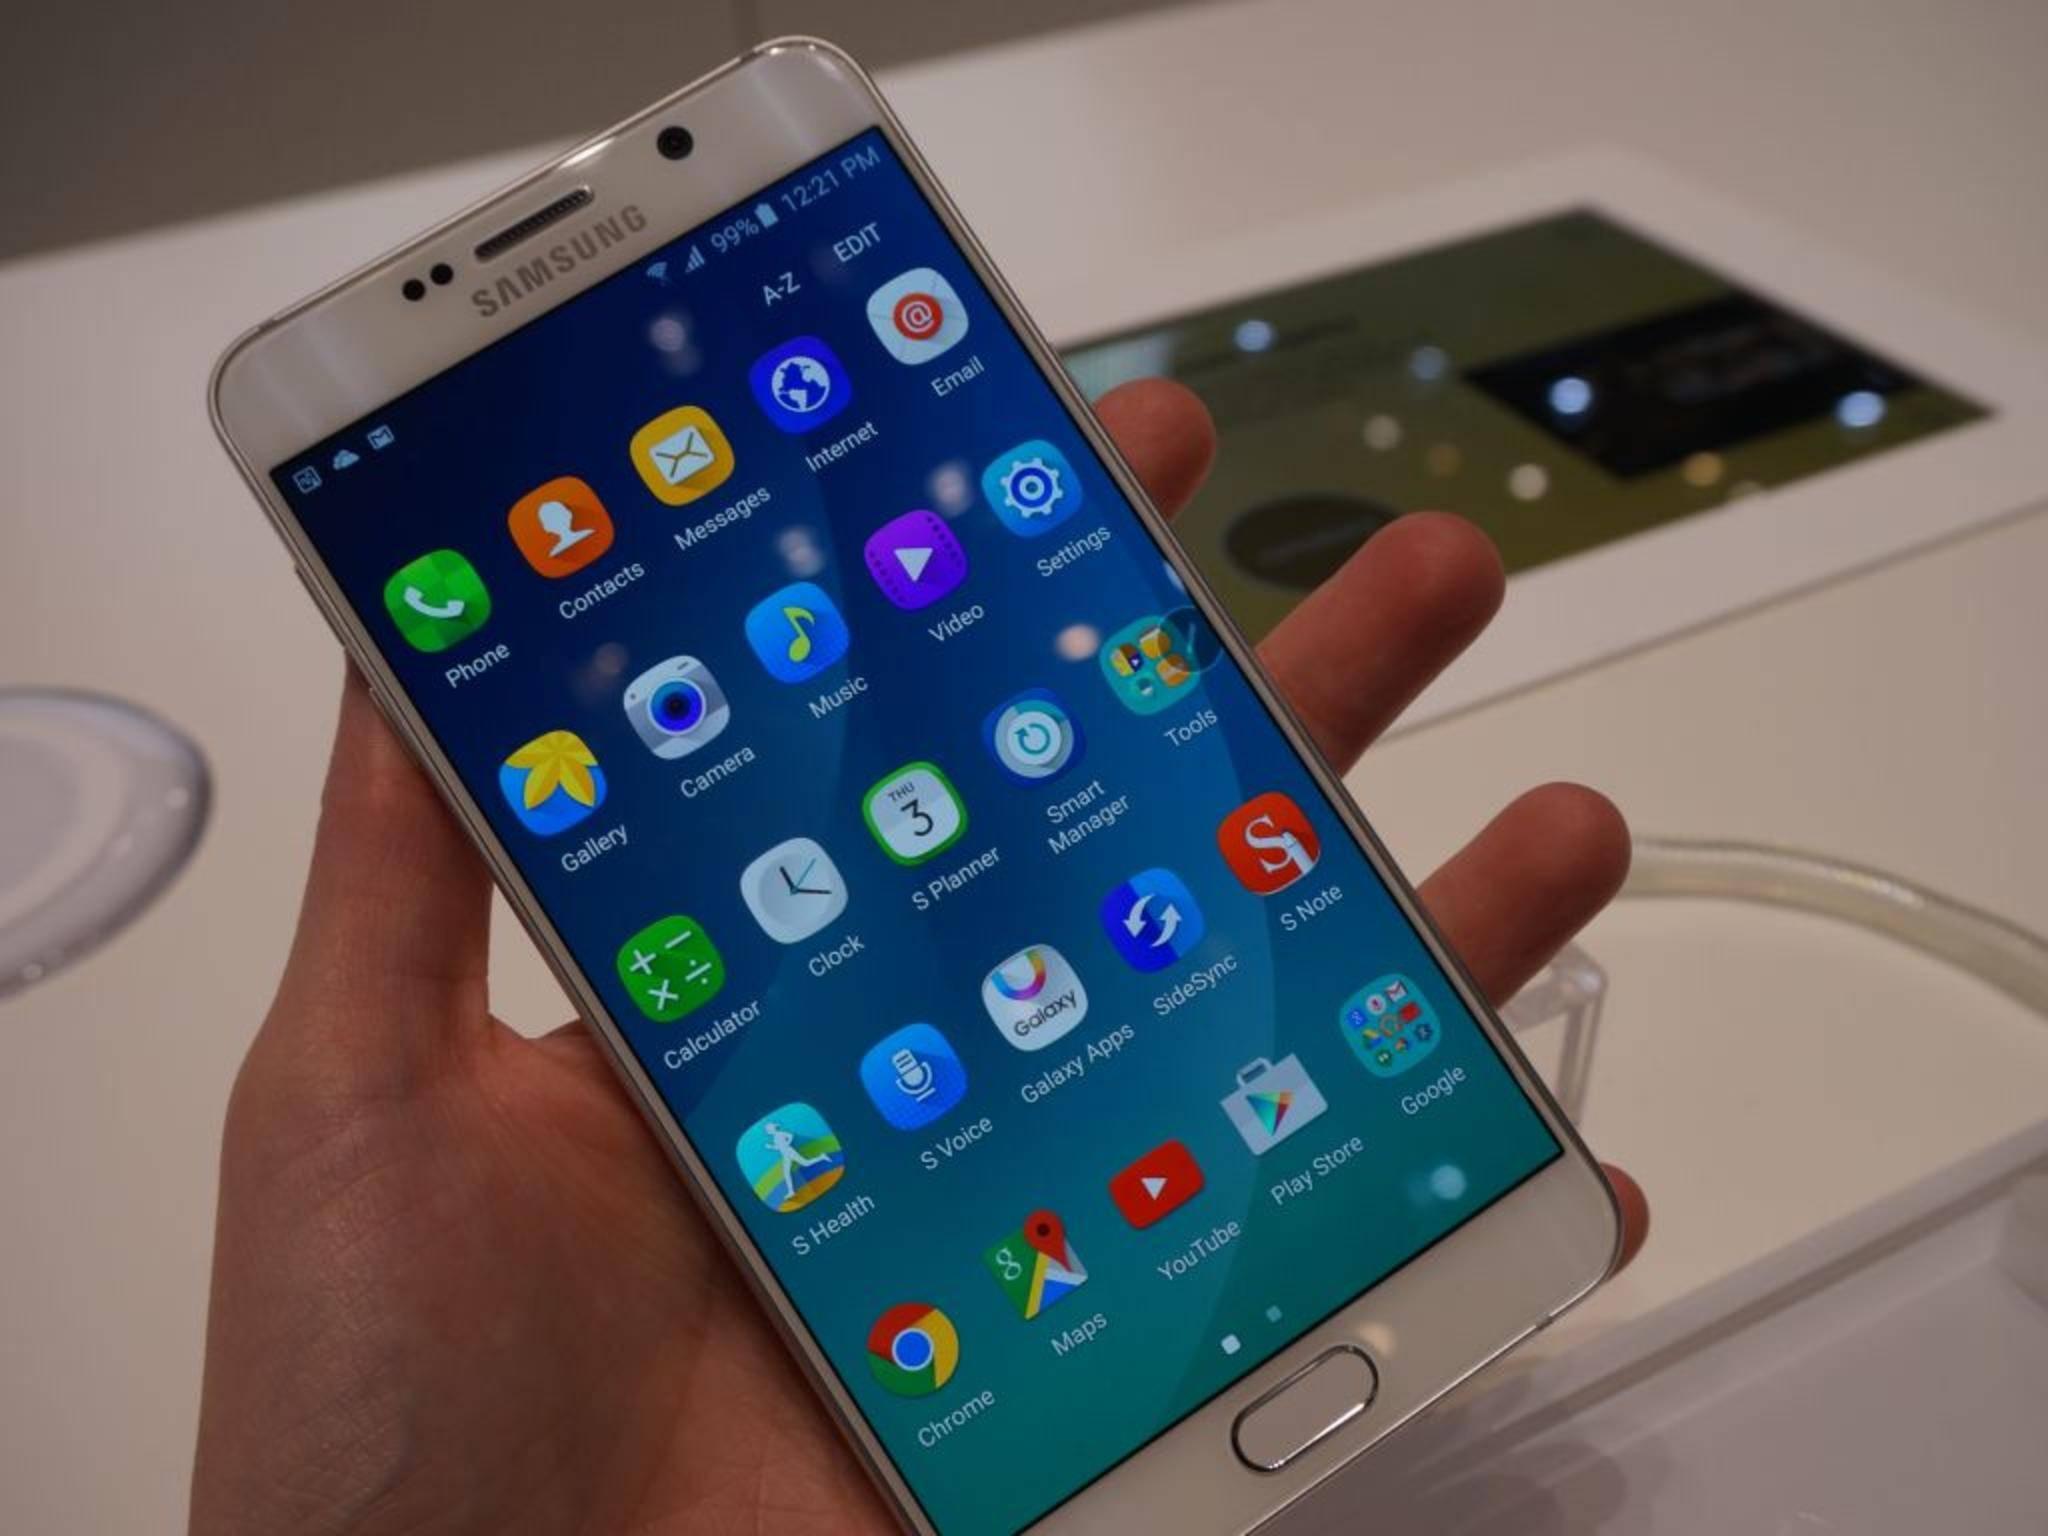 Samsung Galaxy Note 5 14